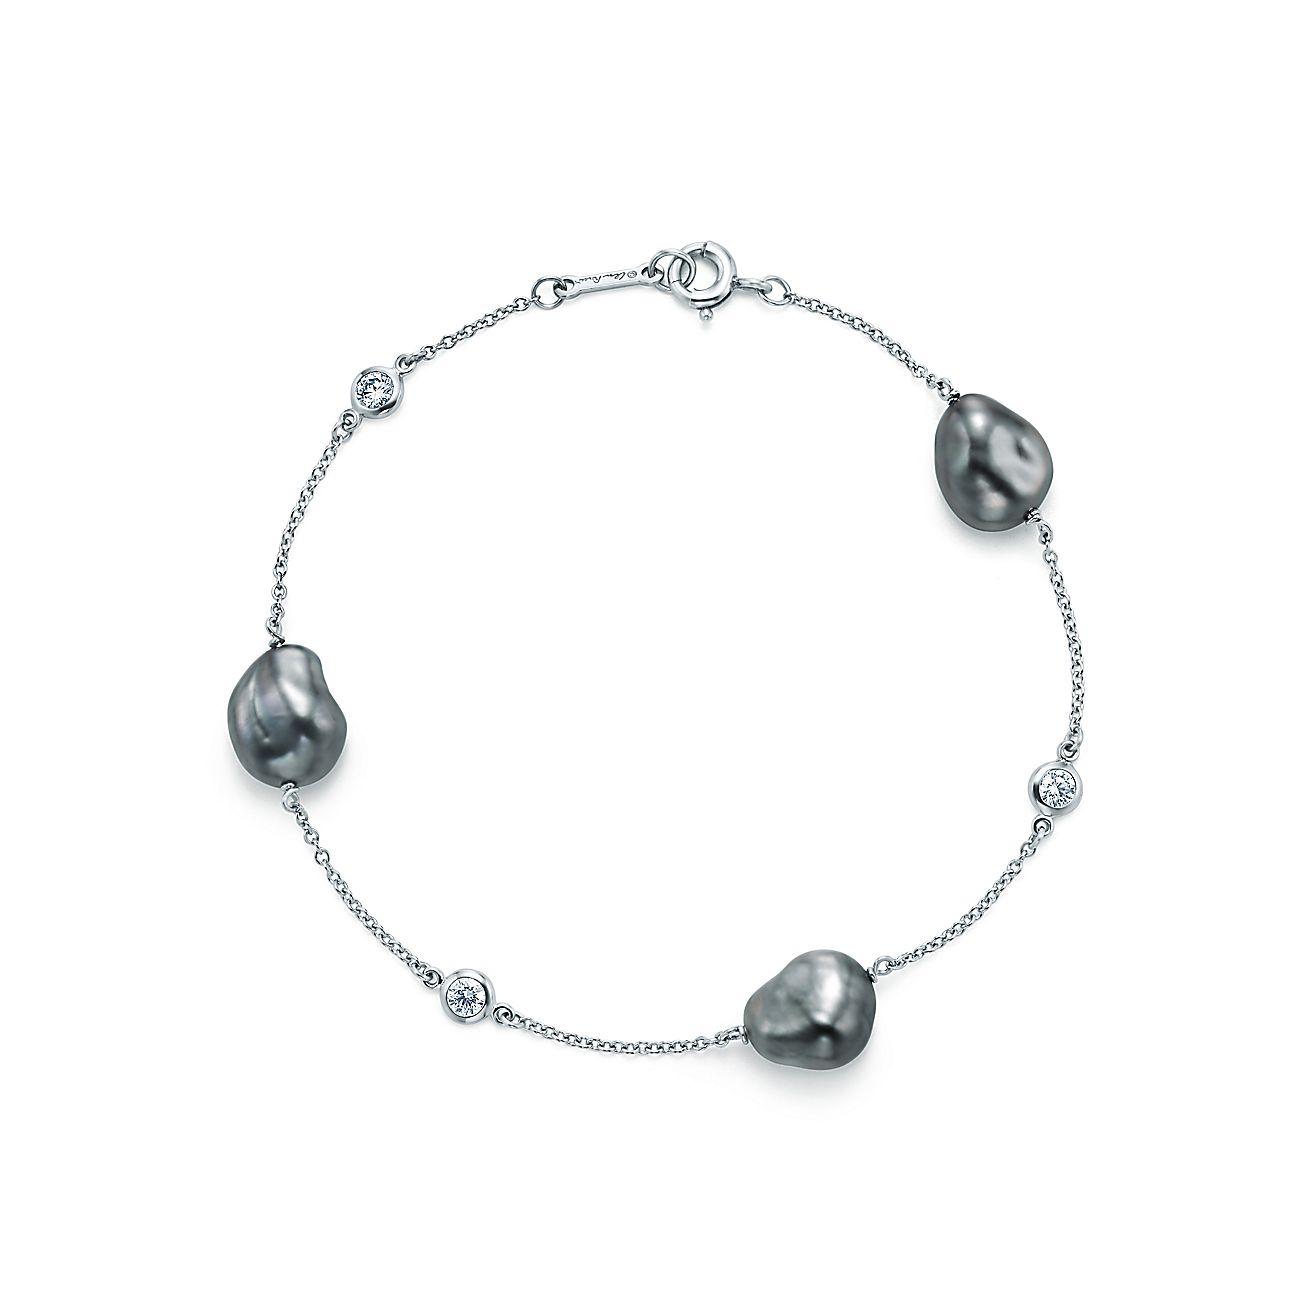 Elsa Peretti® bracelet with Tahitian Keshi pearls and